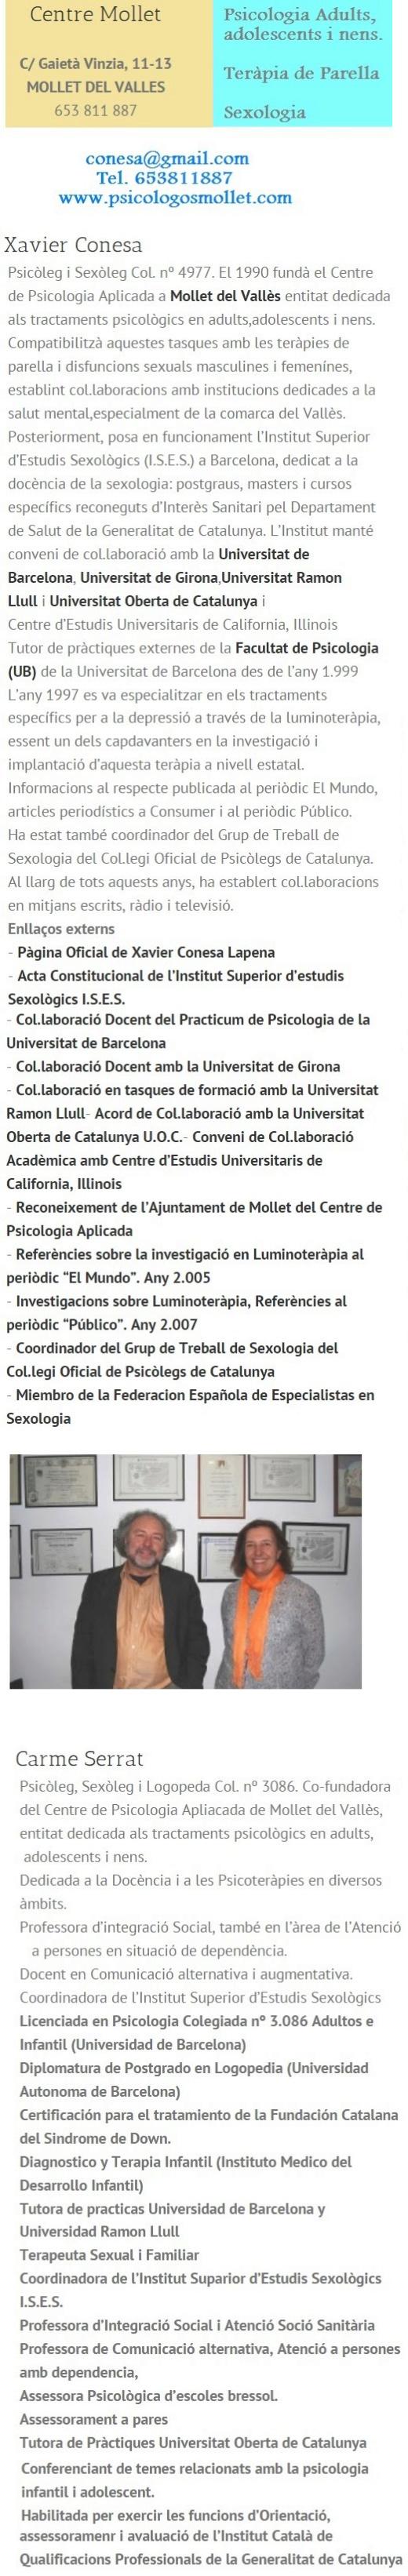 Consejero Matrimonial Mollet, Granollers, Comarca del Valles, Barcelona Optima12